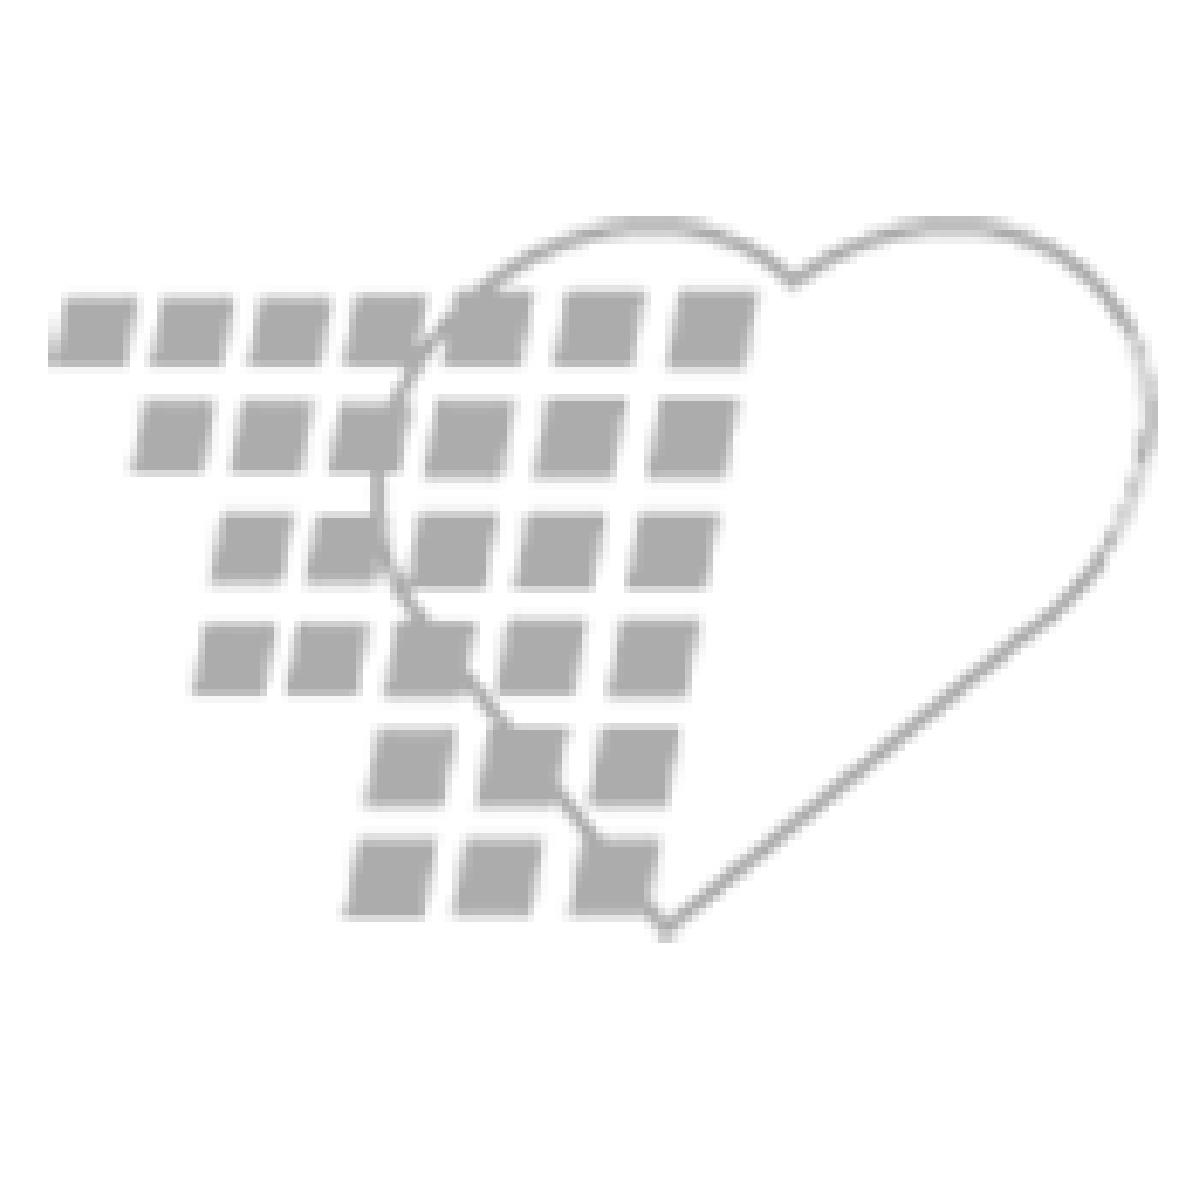 06-93-1112 Demo Dose® Simulated Code Drug Set #2